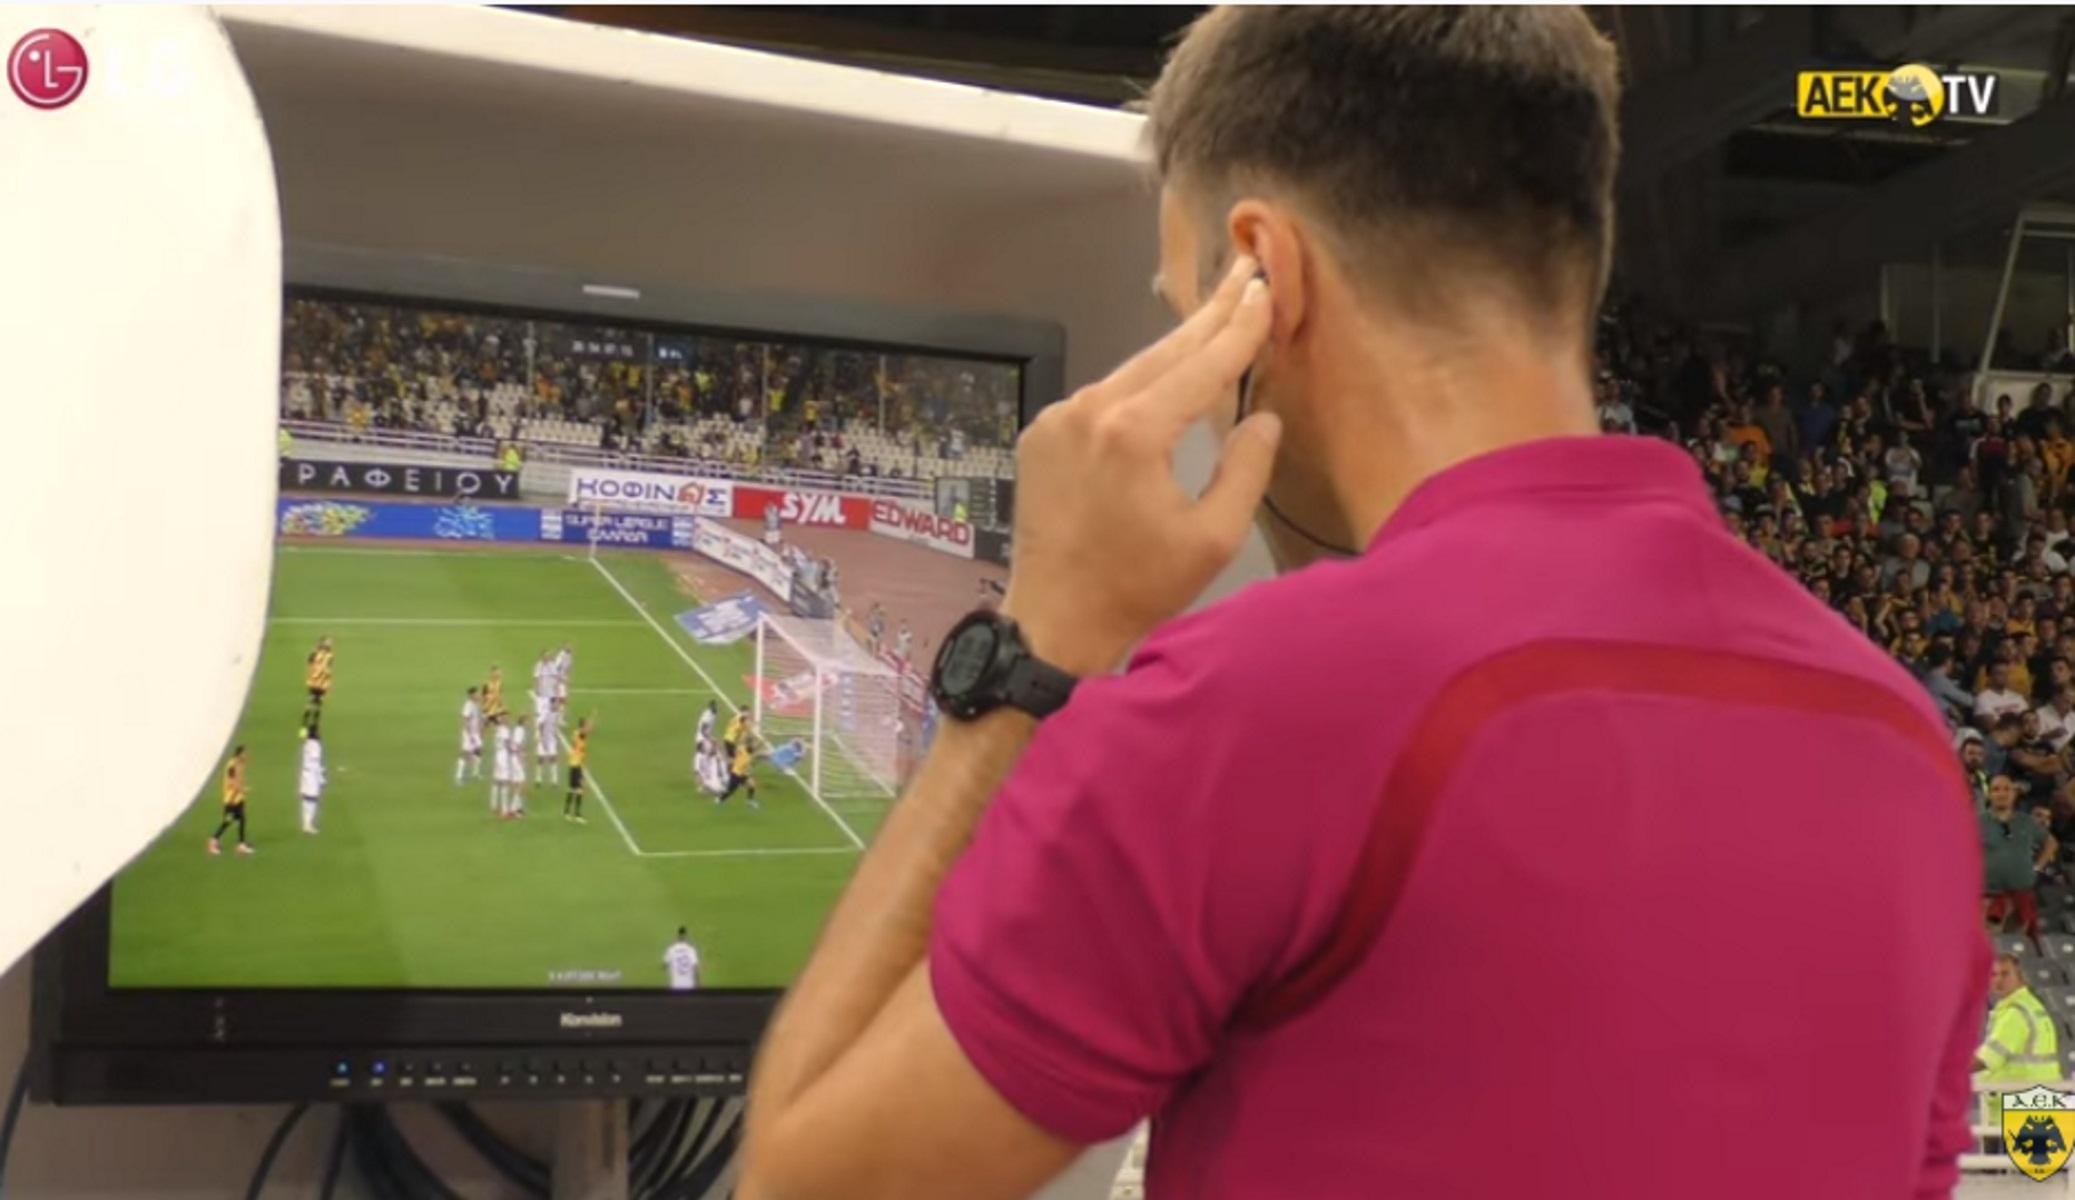 Champions League: Η UEFA δοκιμάζει VAR εξ αποστάσεως στο Σεβίλλη – Τσέλσι